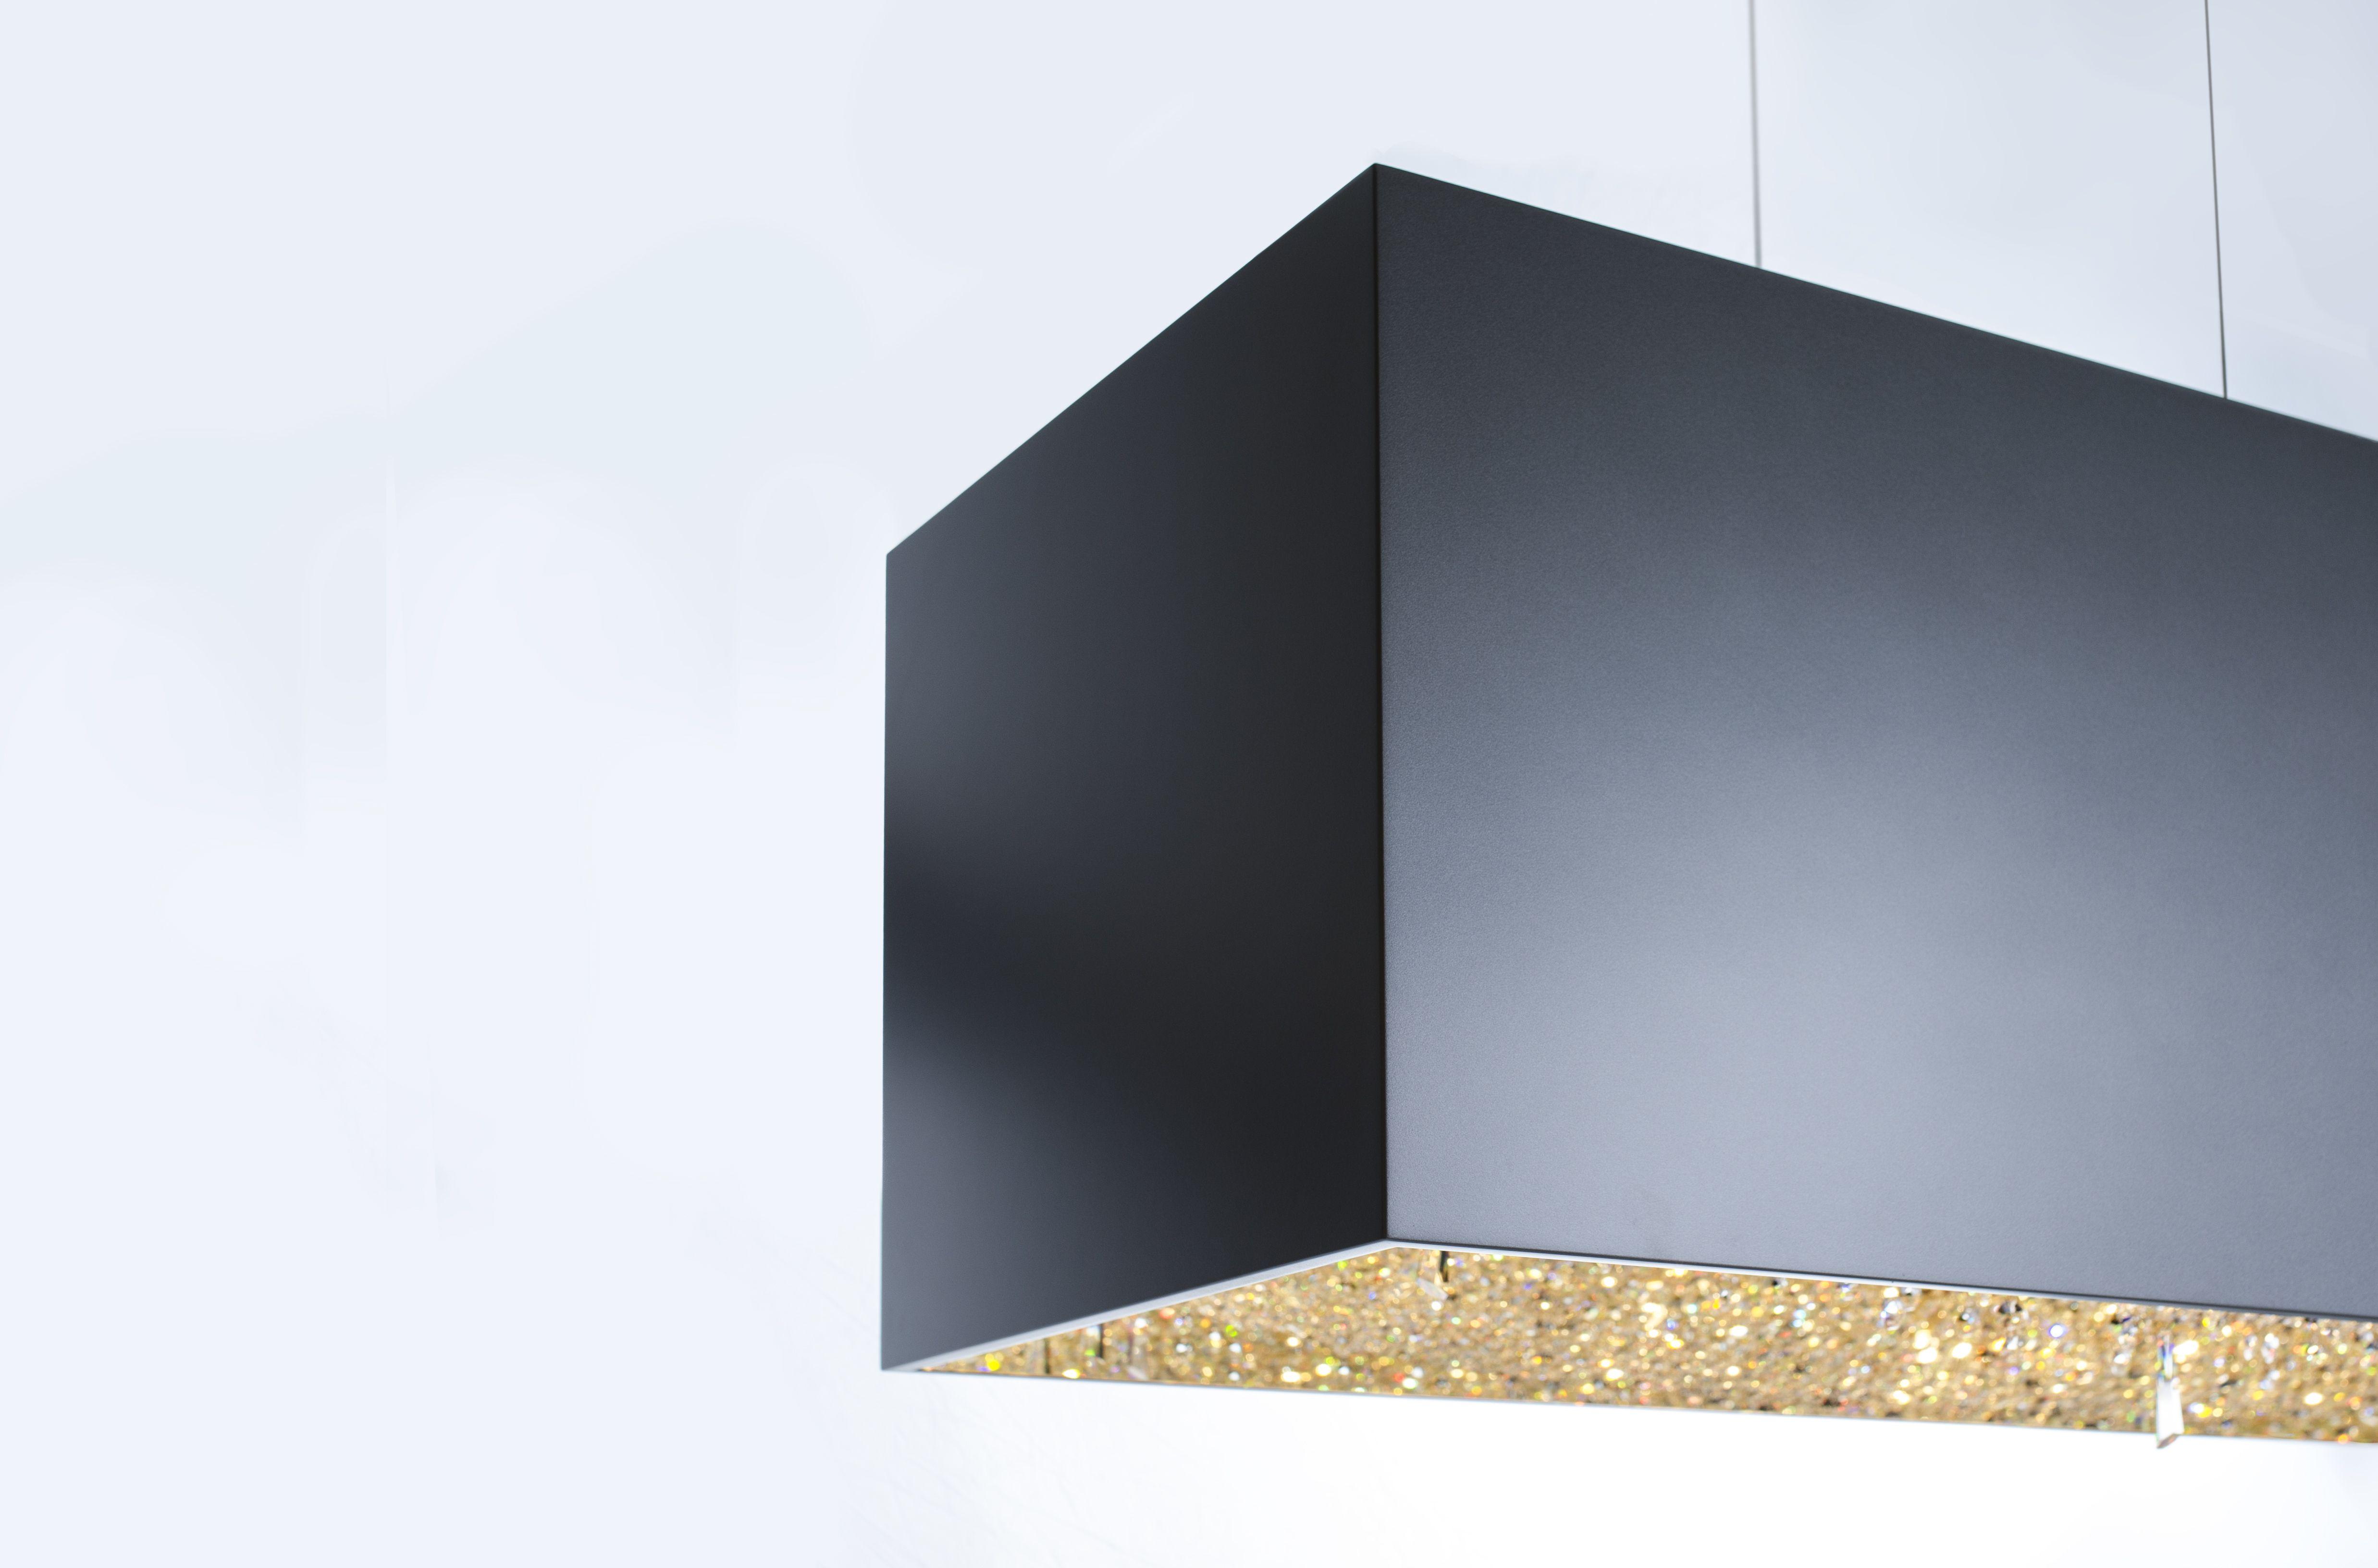 Deep Sky crystal chandelier #Manooi #Chandelier #CrystalChandelier #Design #Lighting #DeepSky #luxury #furniture